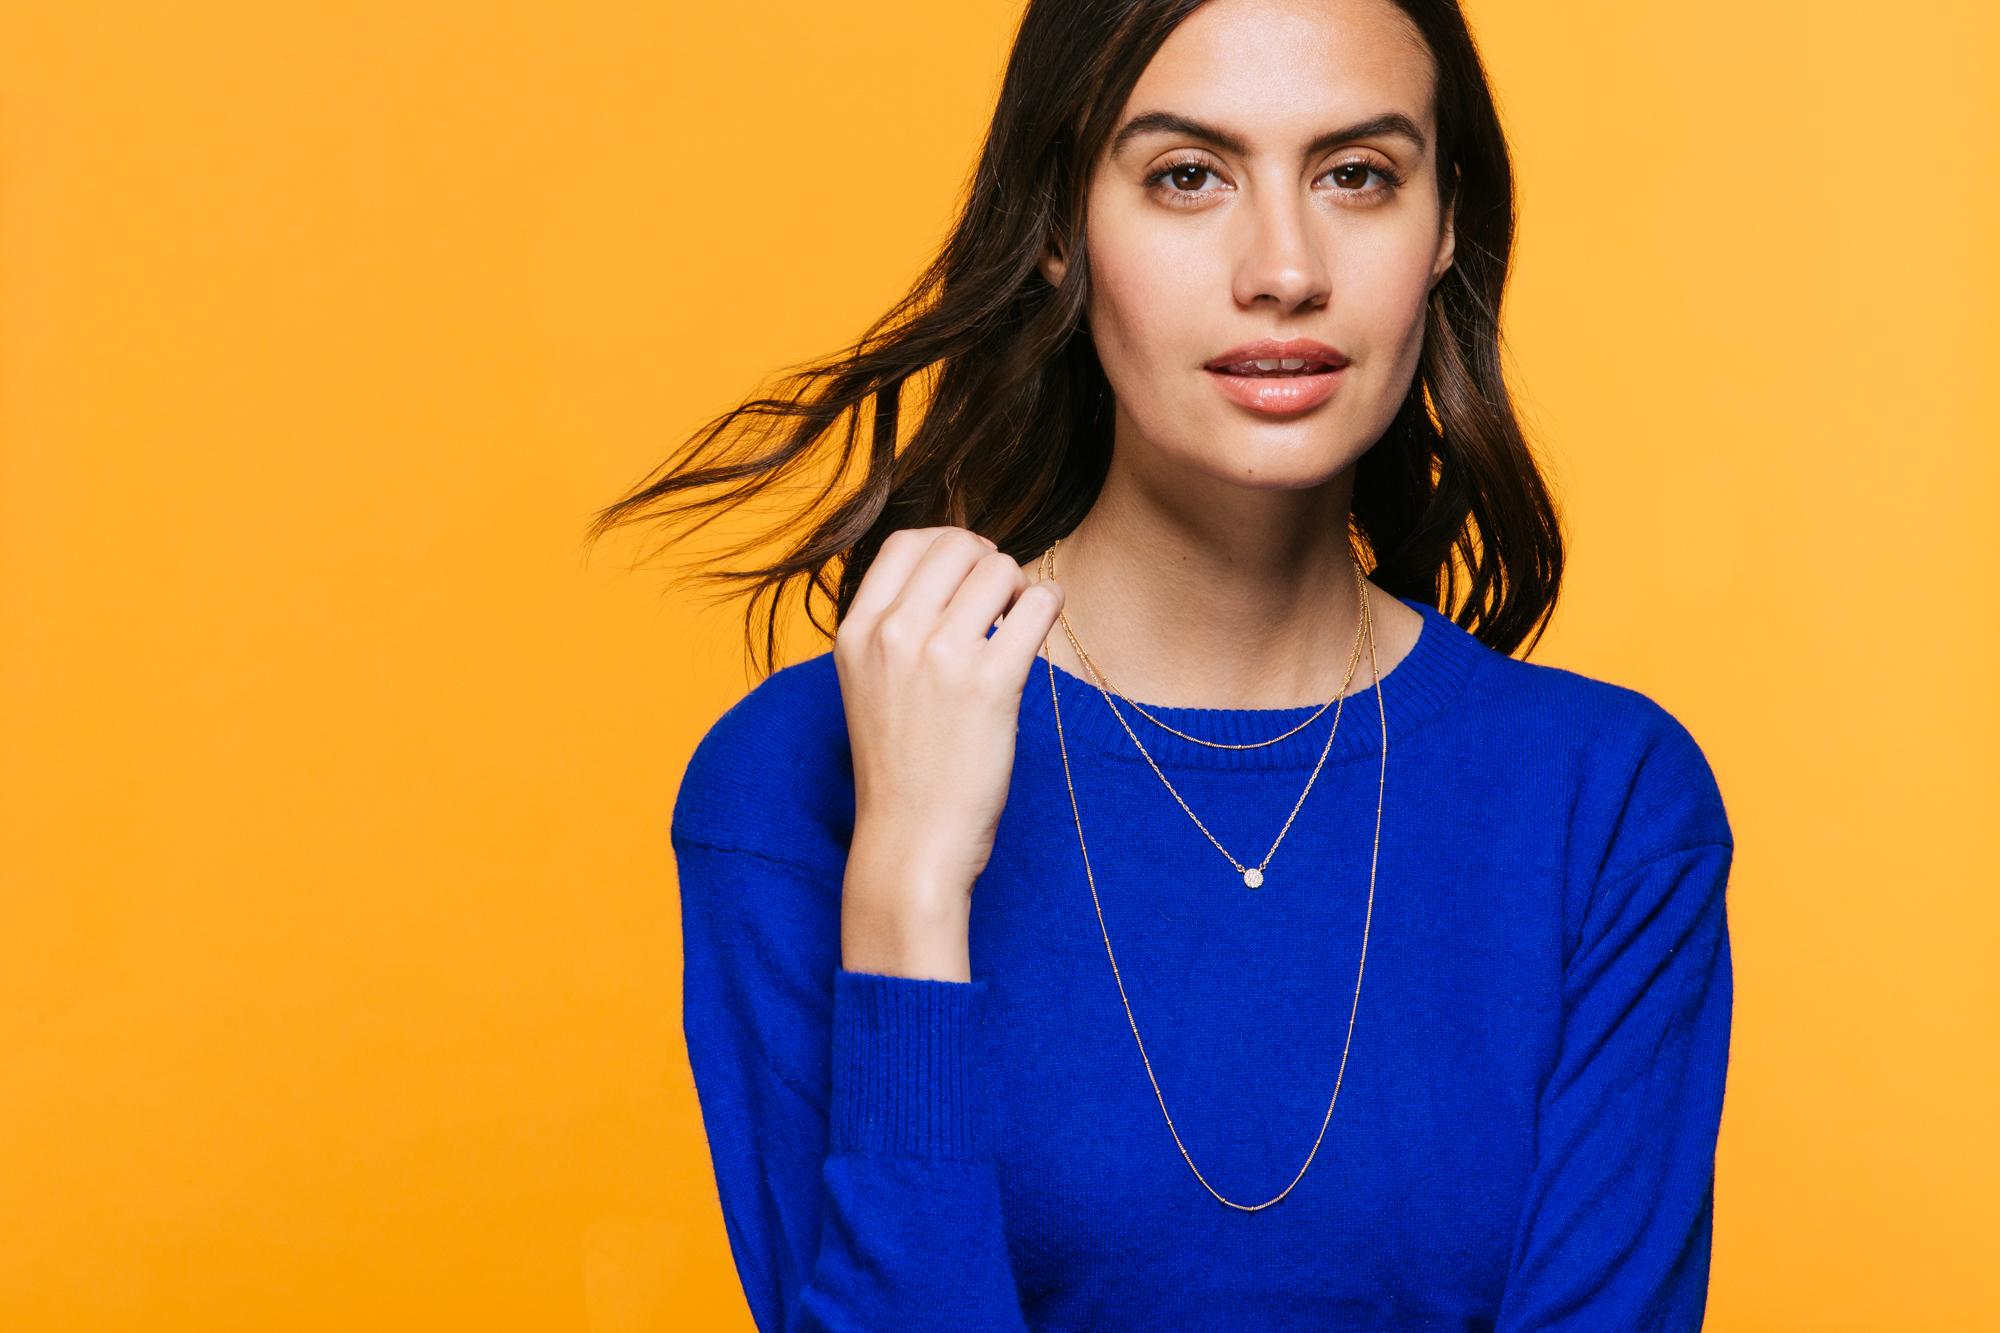 102_Kris-Nations-jewelry-lookbook-ecommerce-studio.jpg